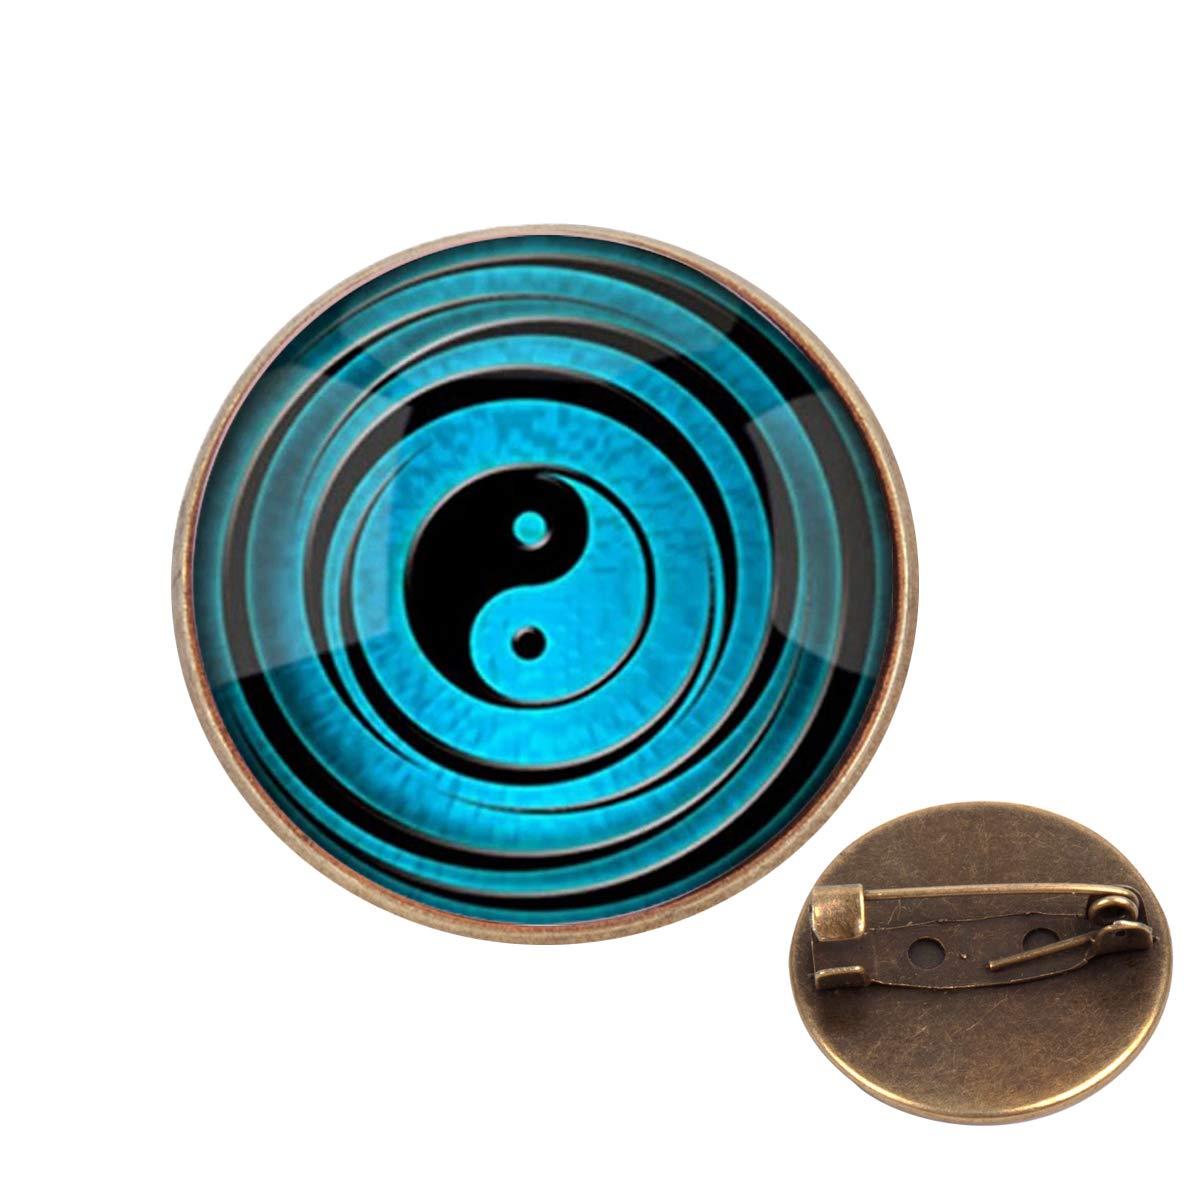 Pinback Buttons Badges Pins Blue Yin Yang Lapel Pin Brooch Clip Trendy Accessory Jacket T-Shirt Bag Hat Shoe